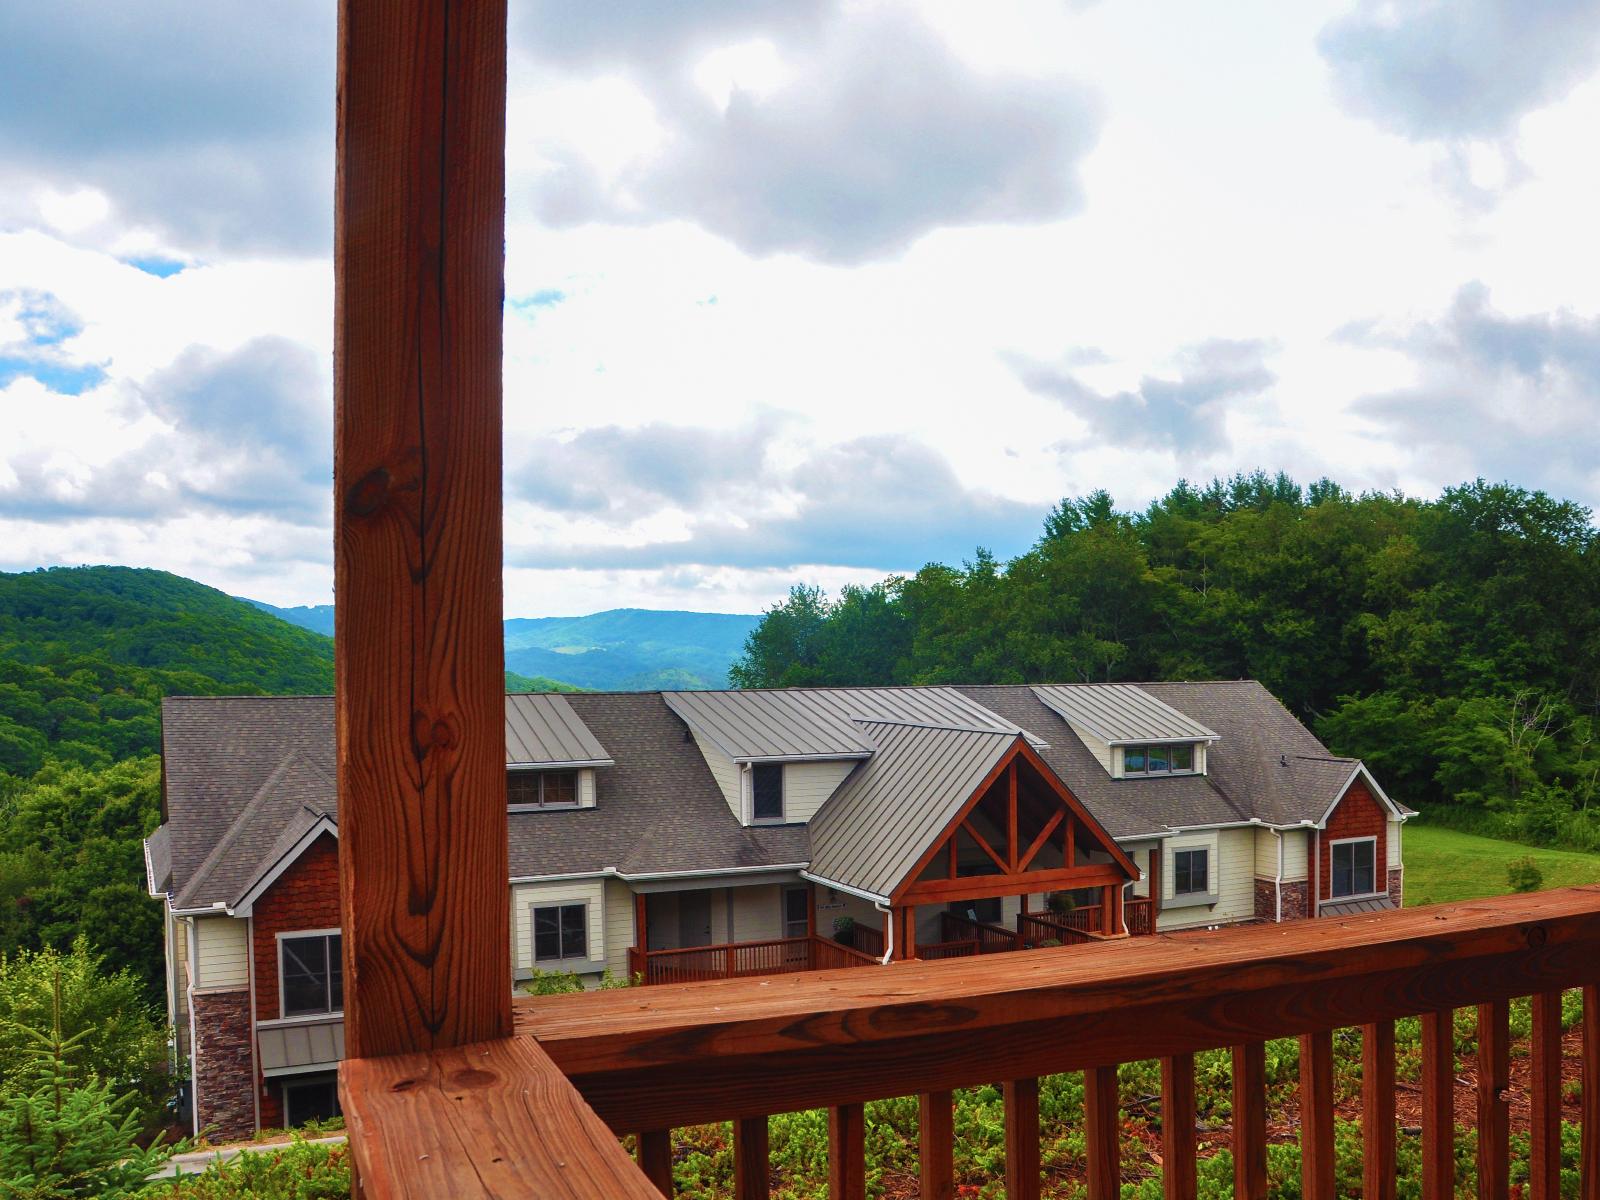 Condominium for Sale at The Lodges at Elkmont 110 C Caribou Court Banner Elk, North Carolina 28604 United States